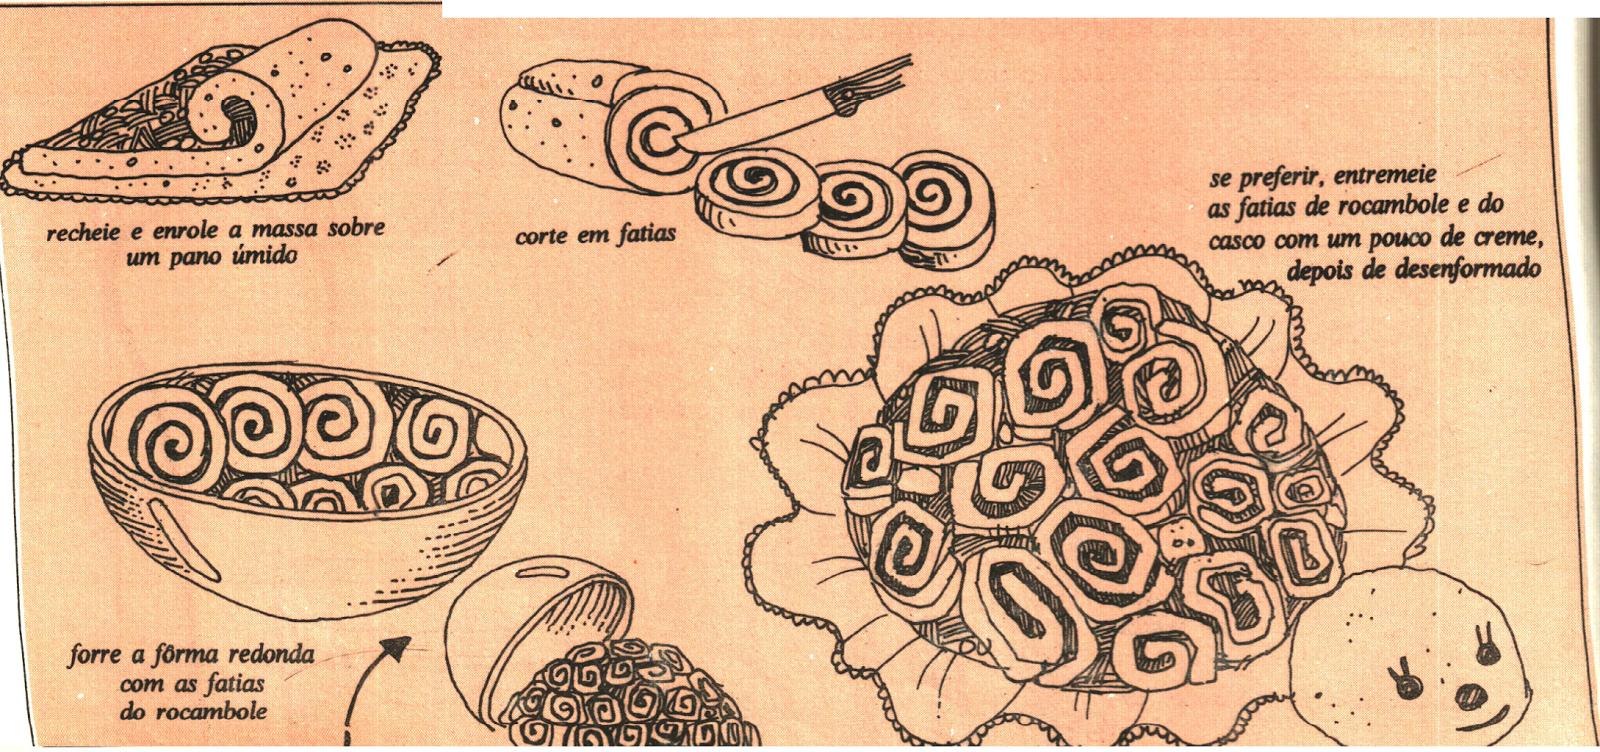 tartaruga assada